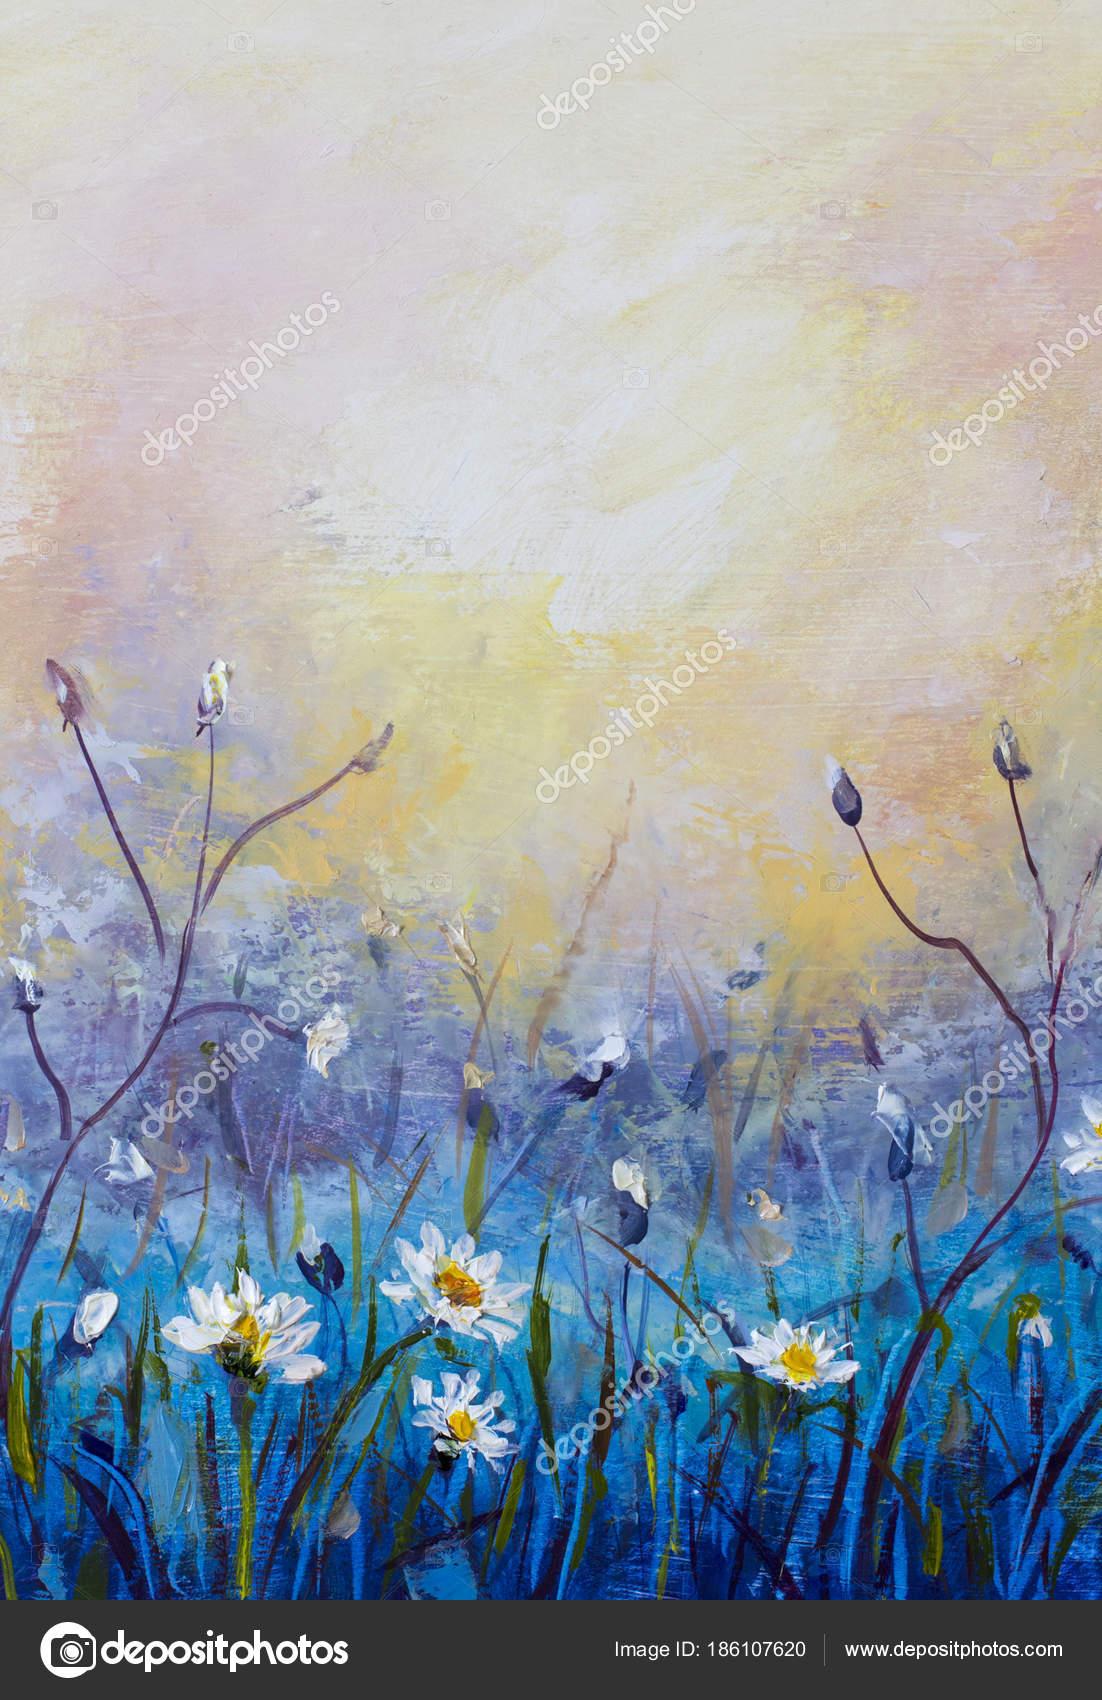 Flowers oil painting wildflowers chamomile small white flower blue flowers oil painting wildflowers chamomile small white flower blue field stock photo mightylinksfo